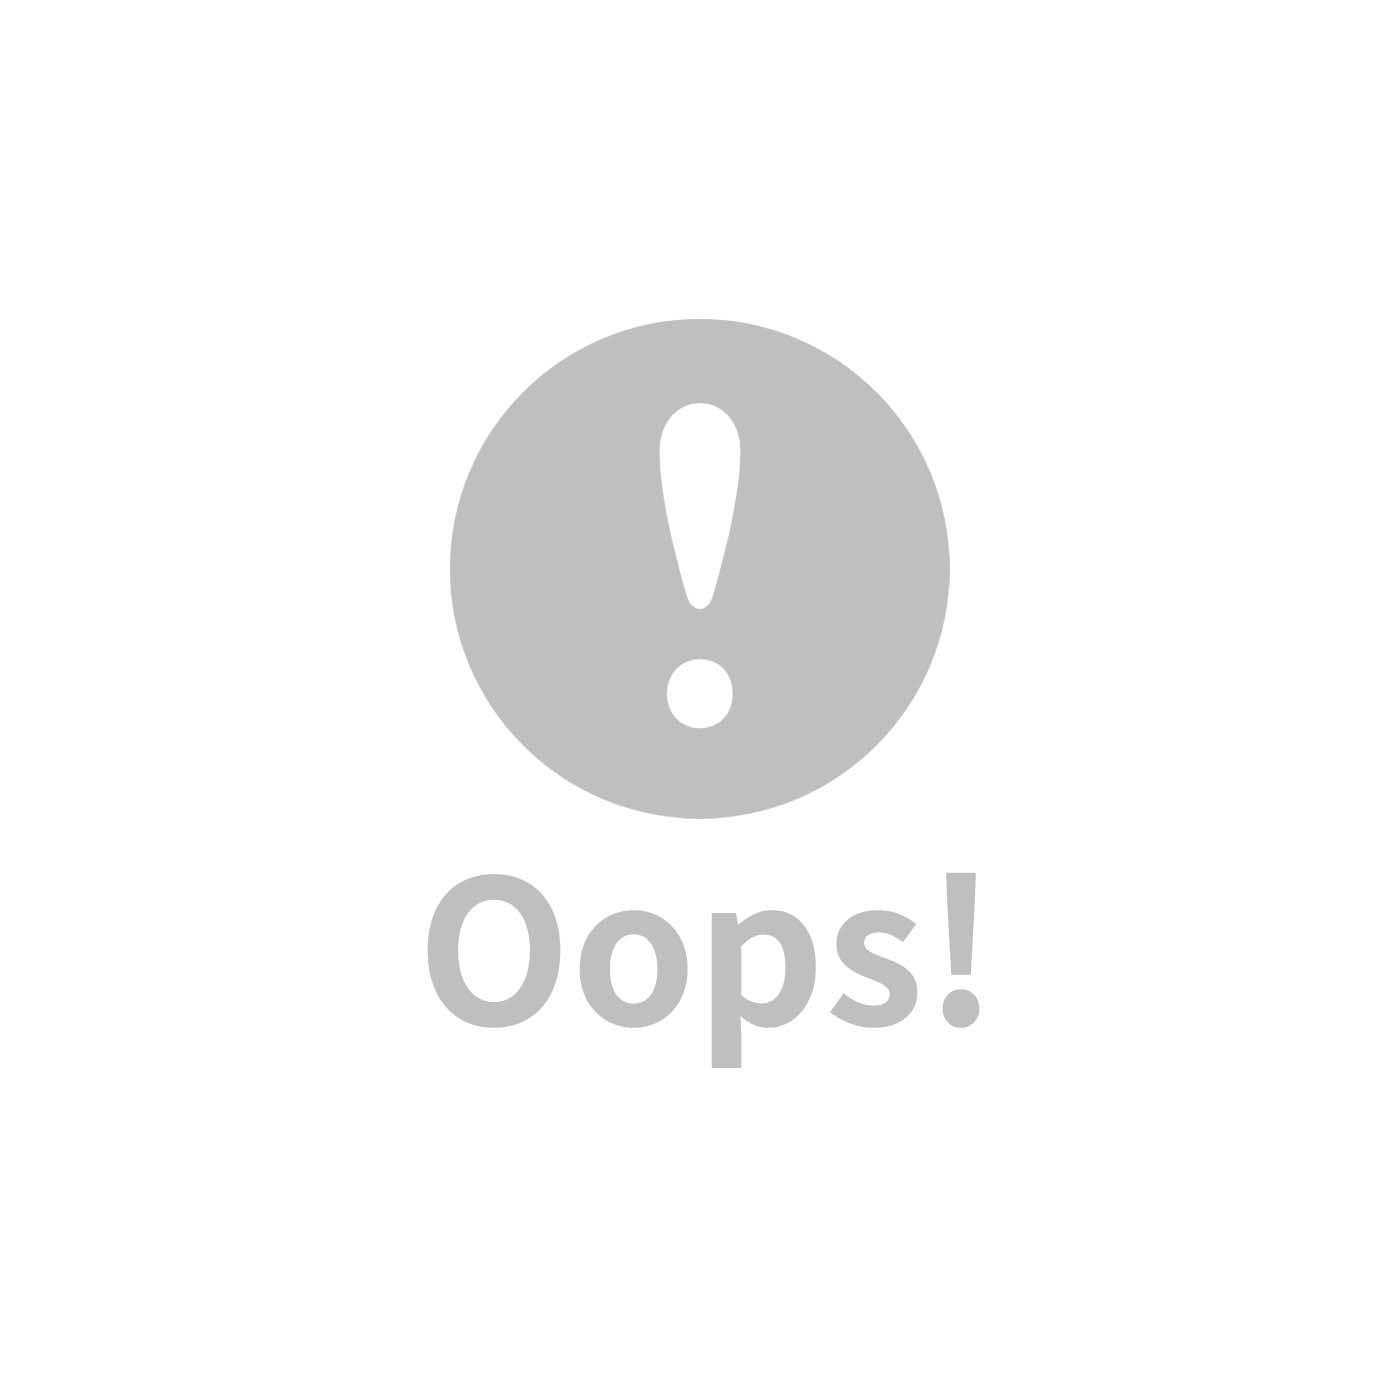 Pacific Baby 美國不鏽鋼保溫太空瓶7oz吸管杯蓋二件組(自信橘7oz+紅配件組)